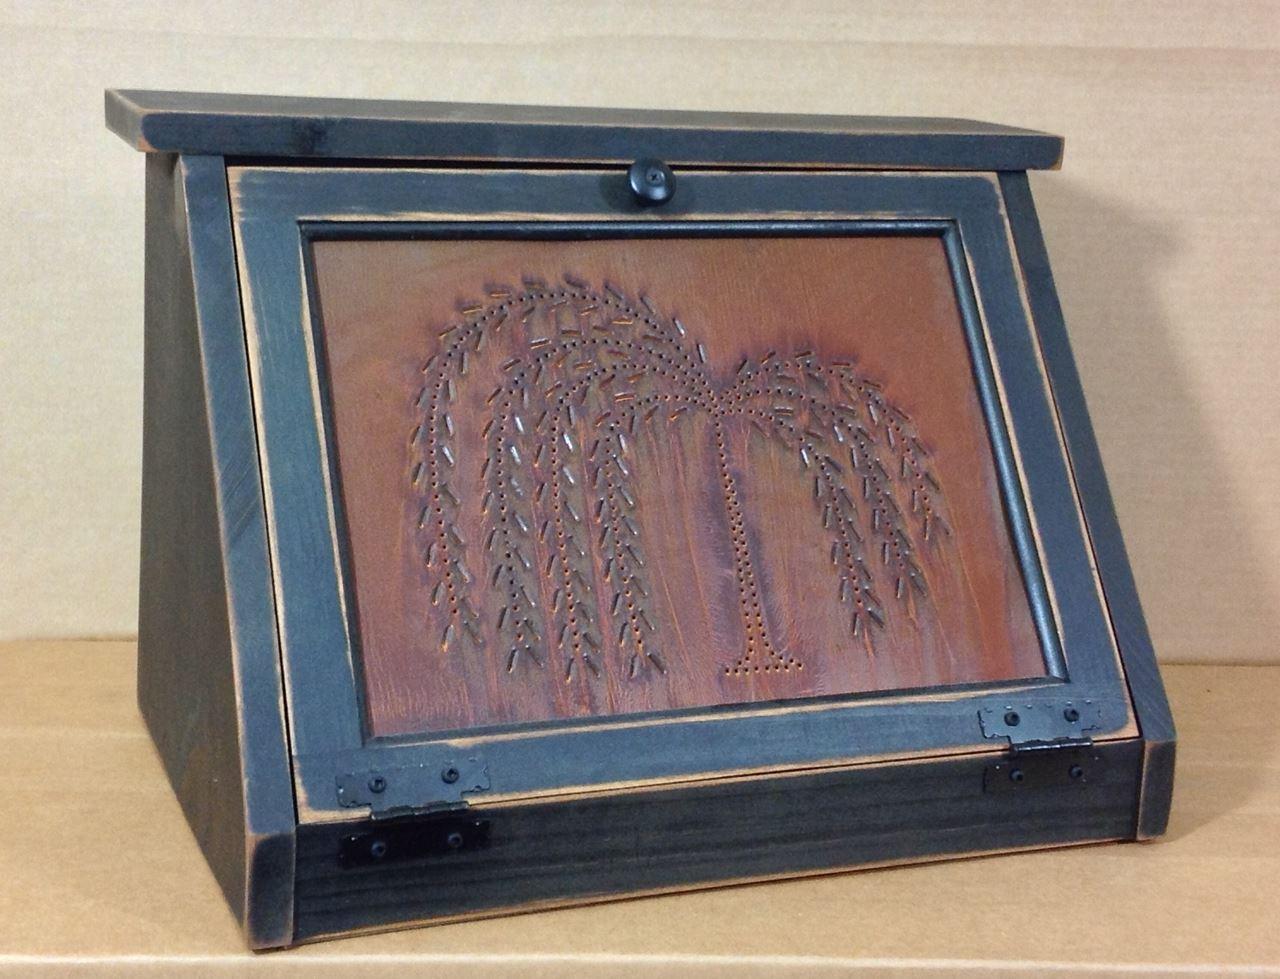 Four Seasons Furnishings Amish Made Furniture Vintage